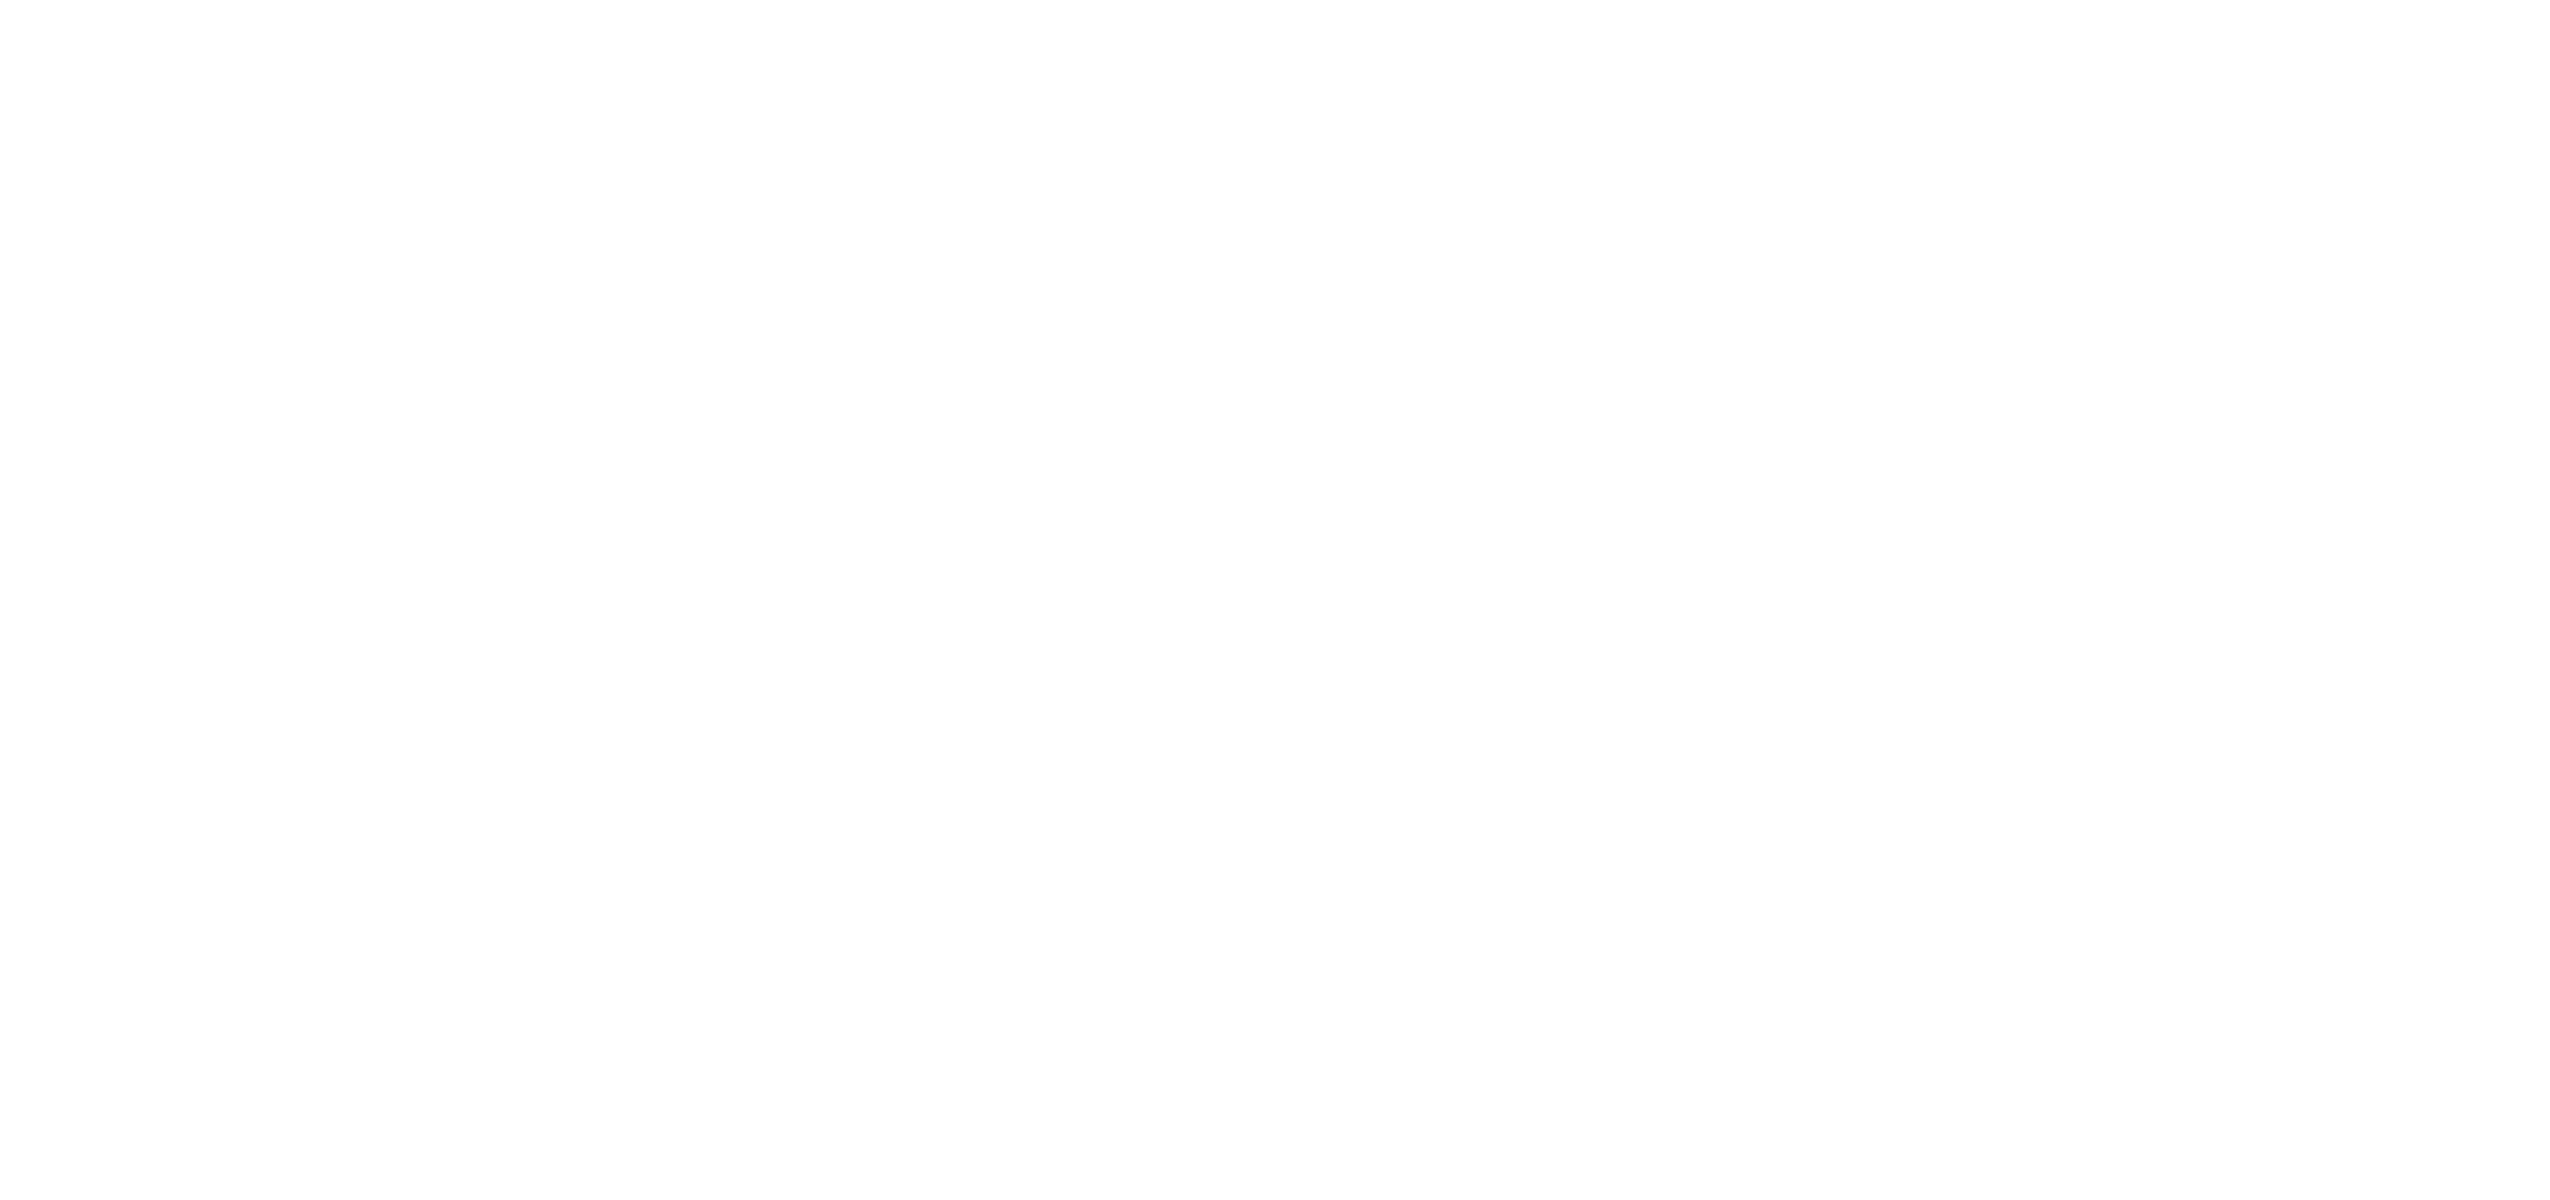 Paylogix Logo